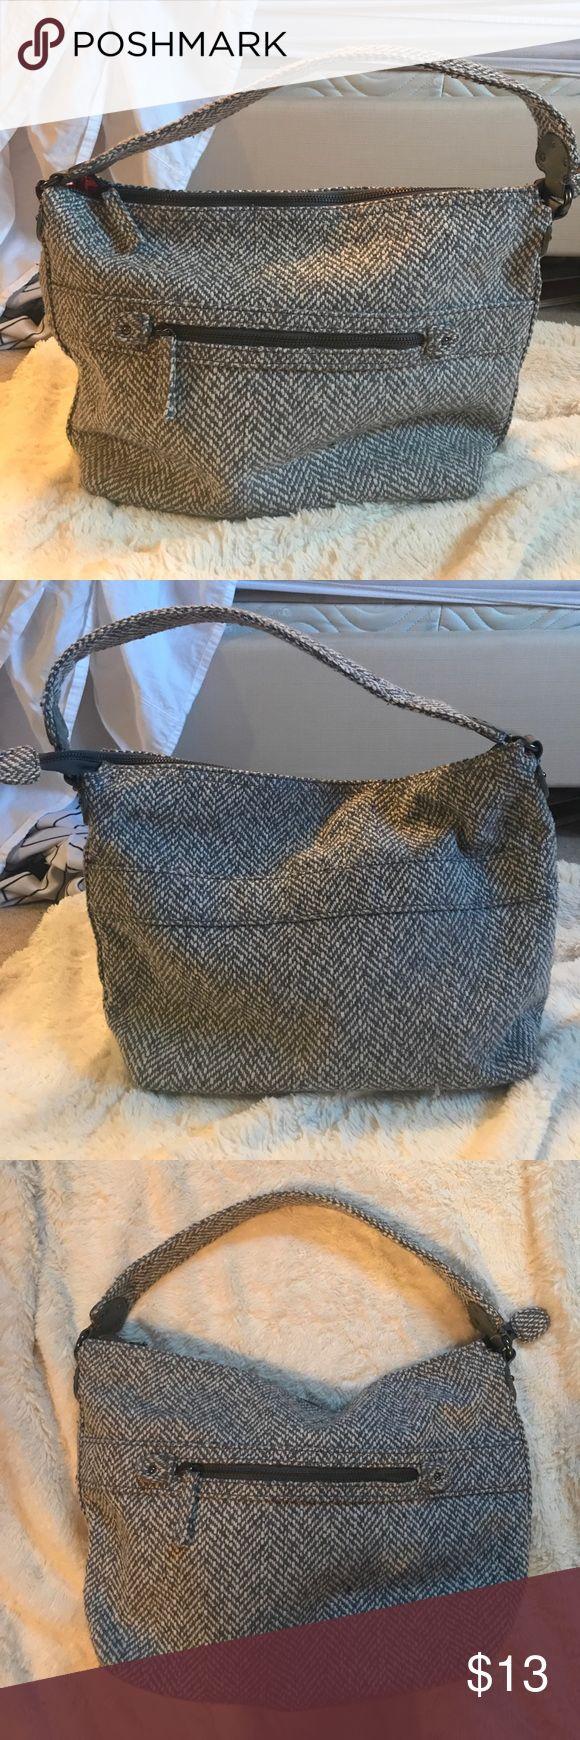 GAP purse GAP shoulder bag. Gently used. GAP Bags Shoulder Bags